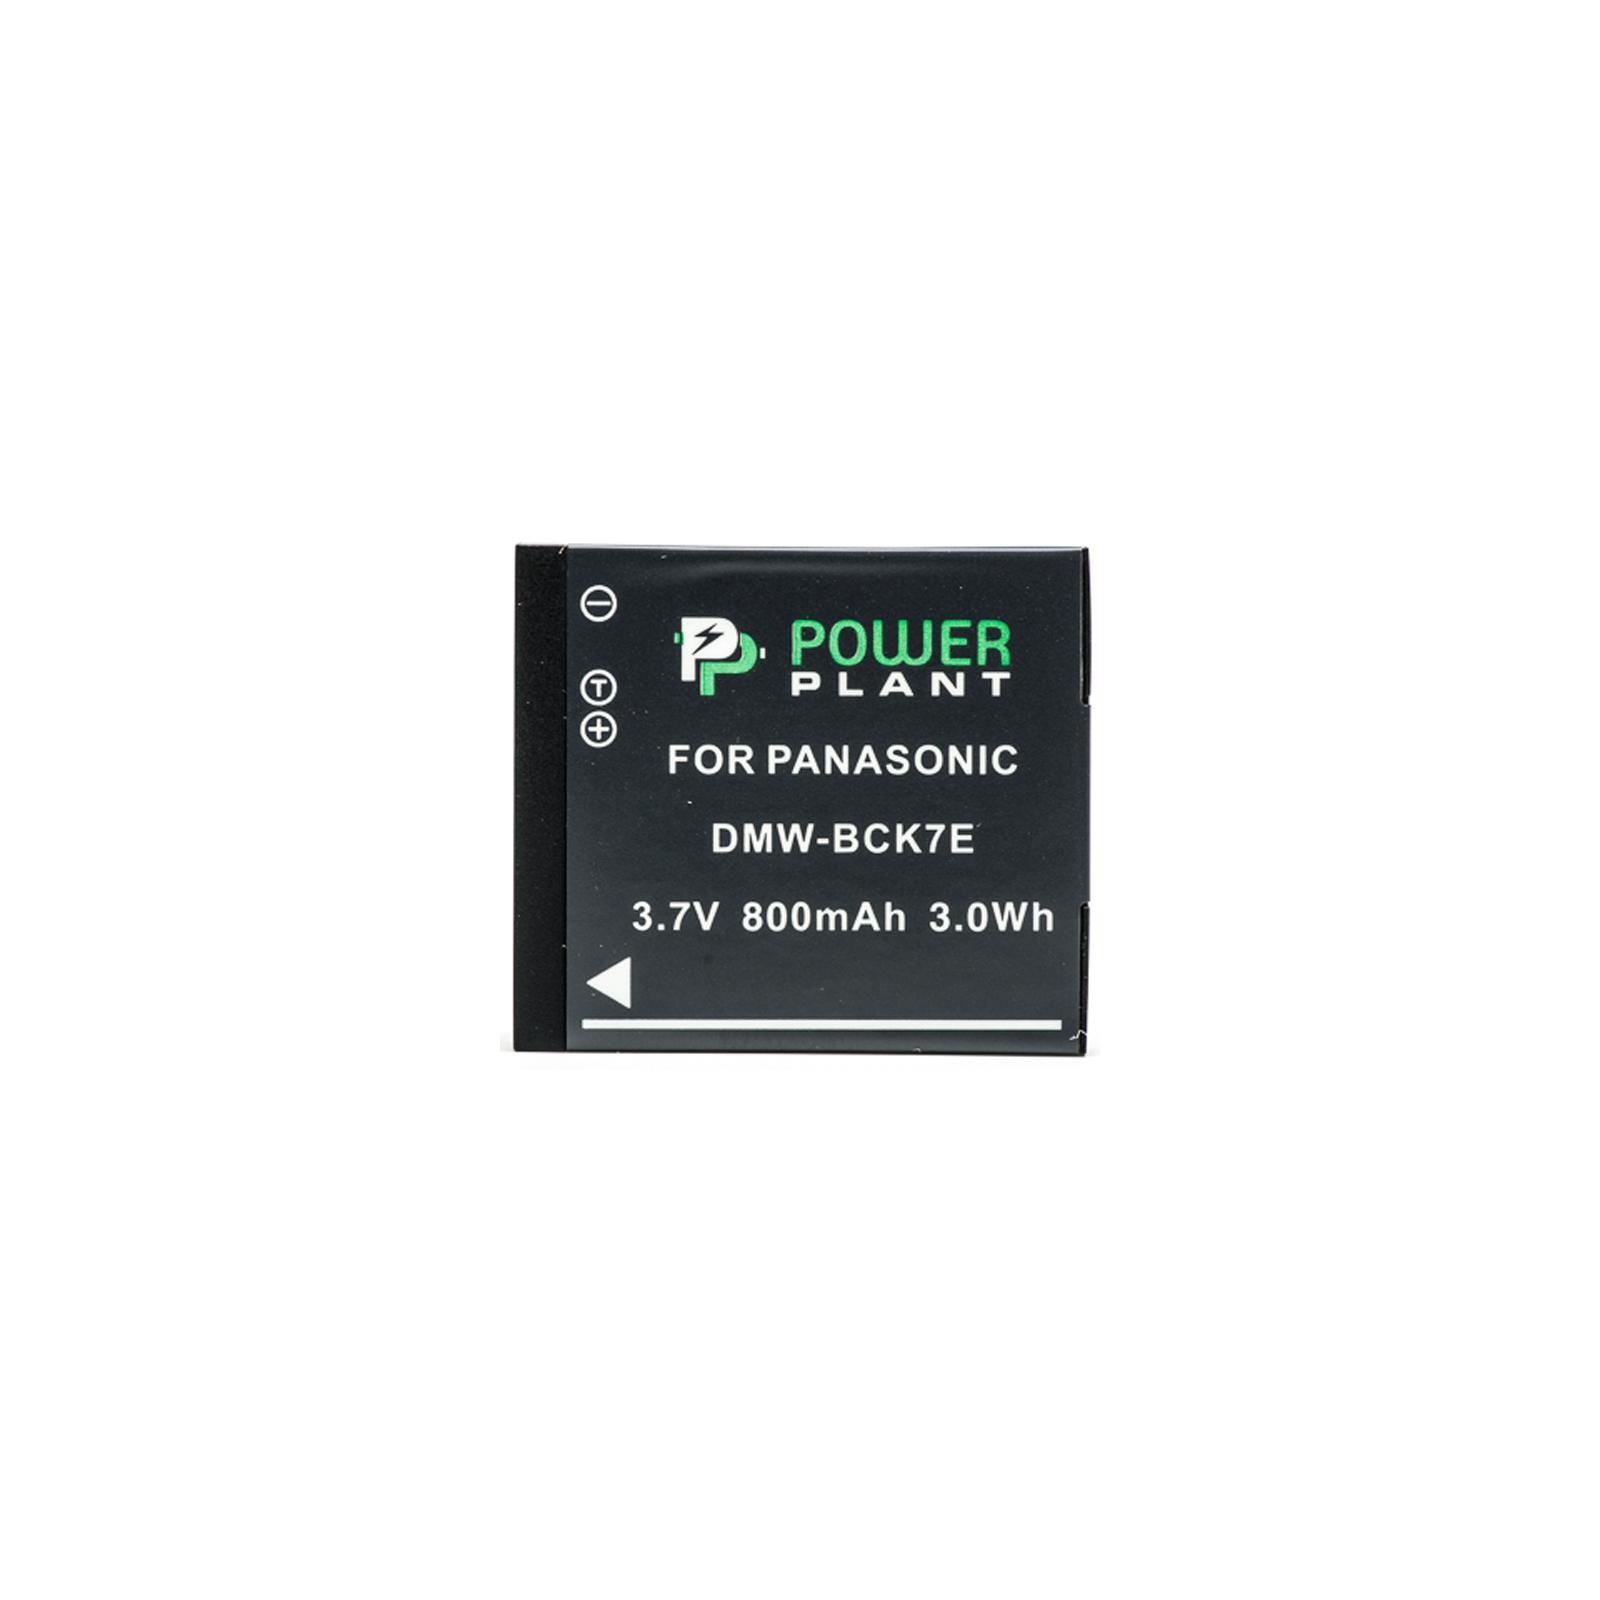 Аккумулятор к фото/видео PowerPlant Panasonic DMW-BCK7E (DV00DV1301) изображение 2